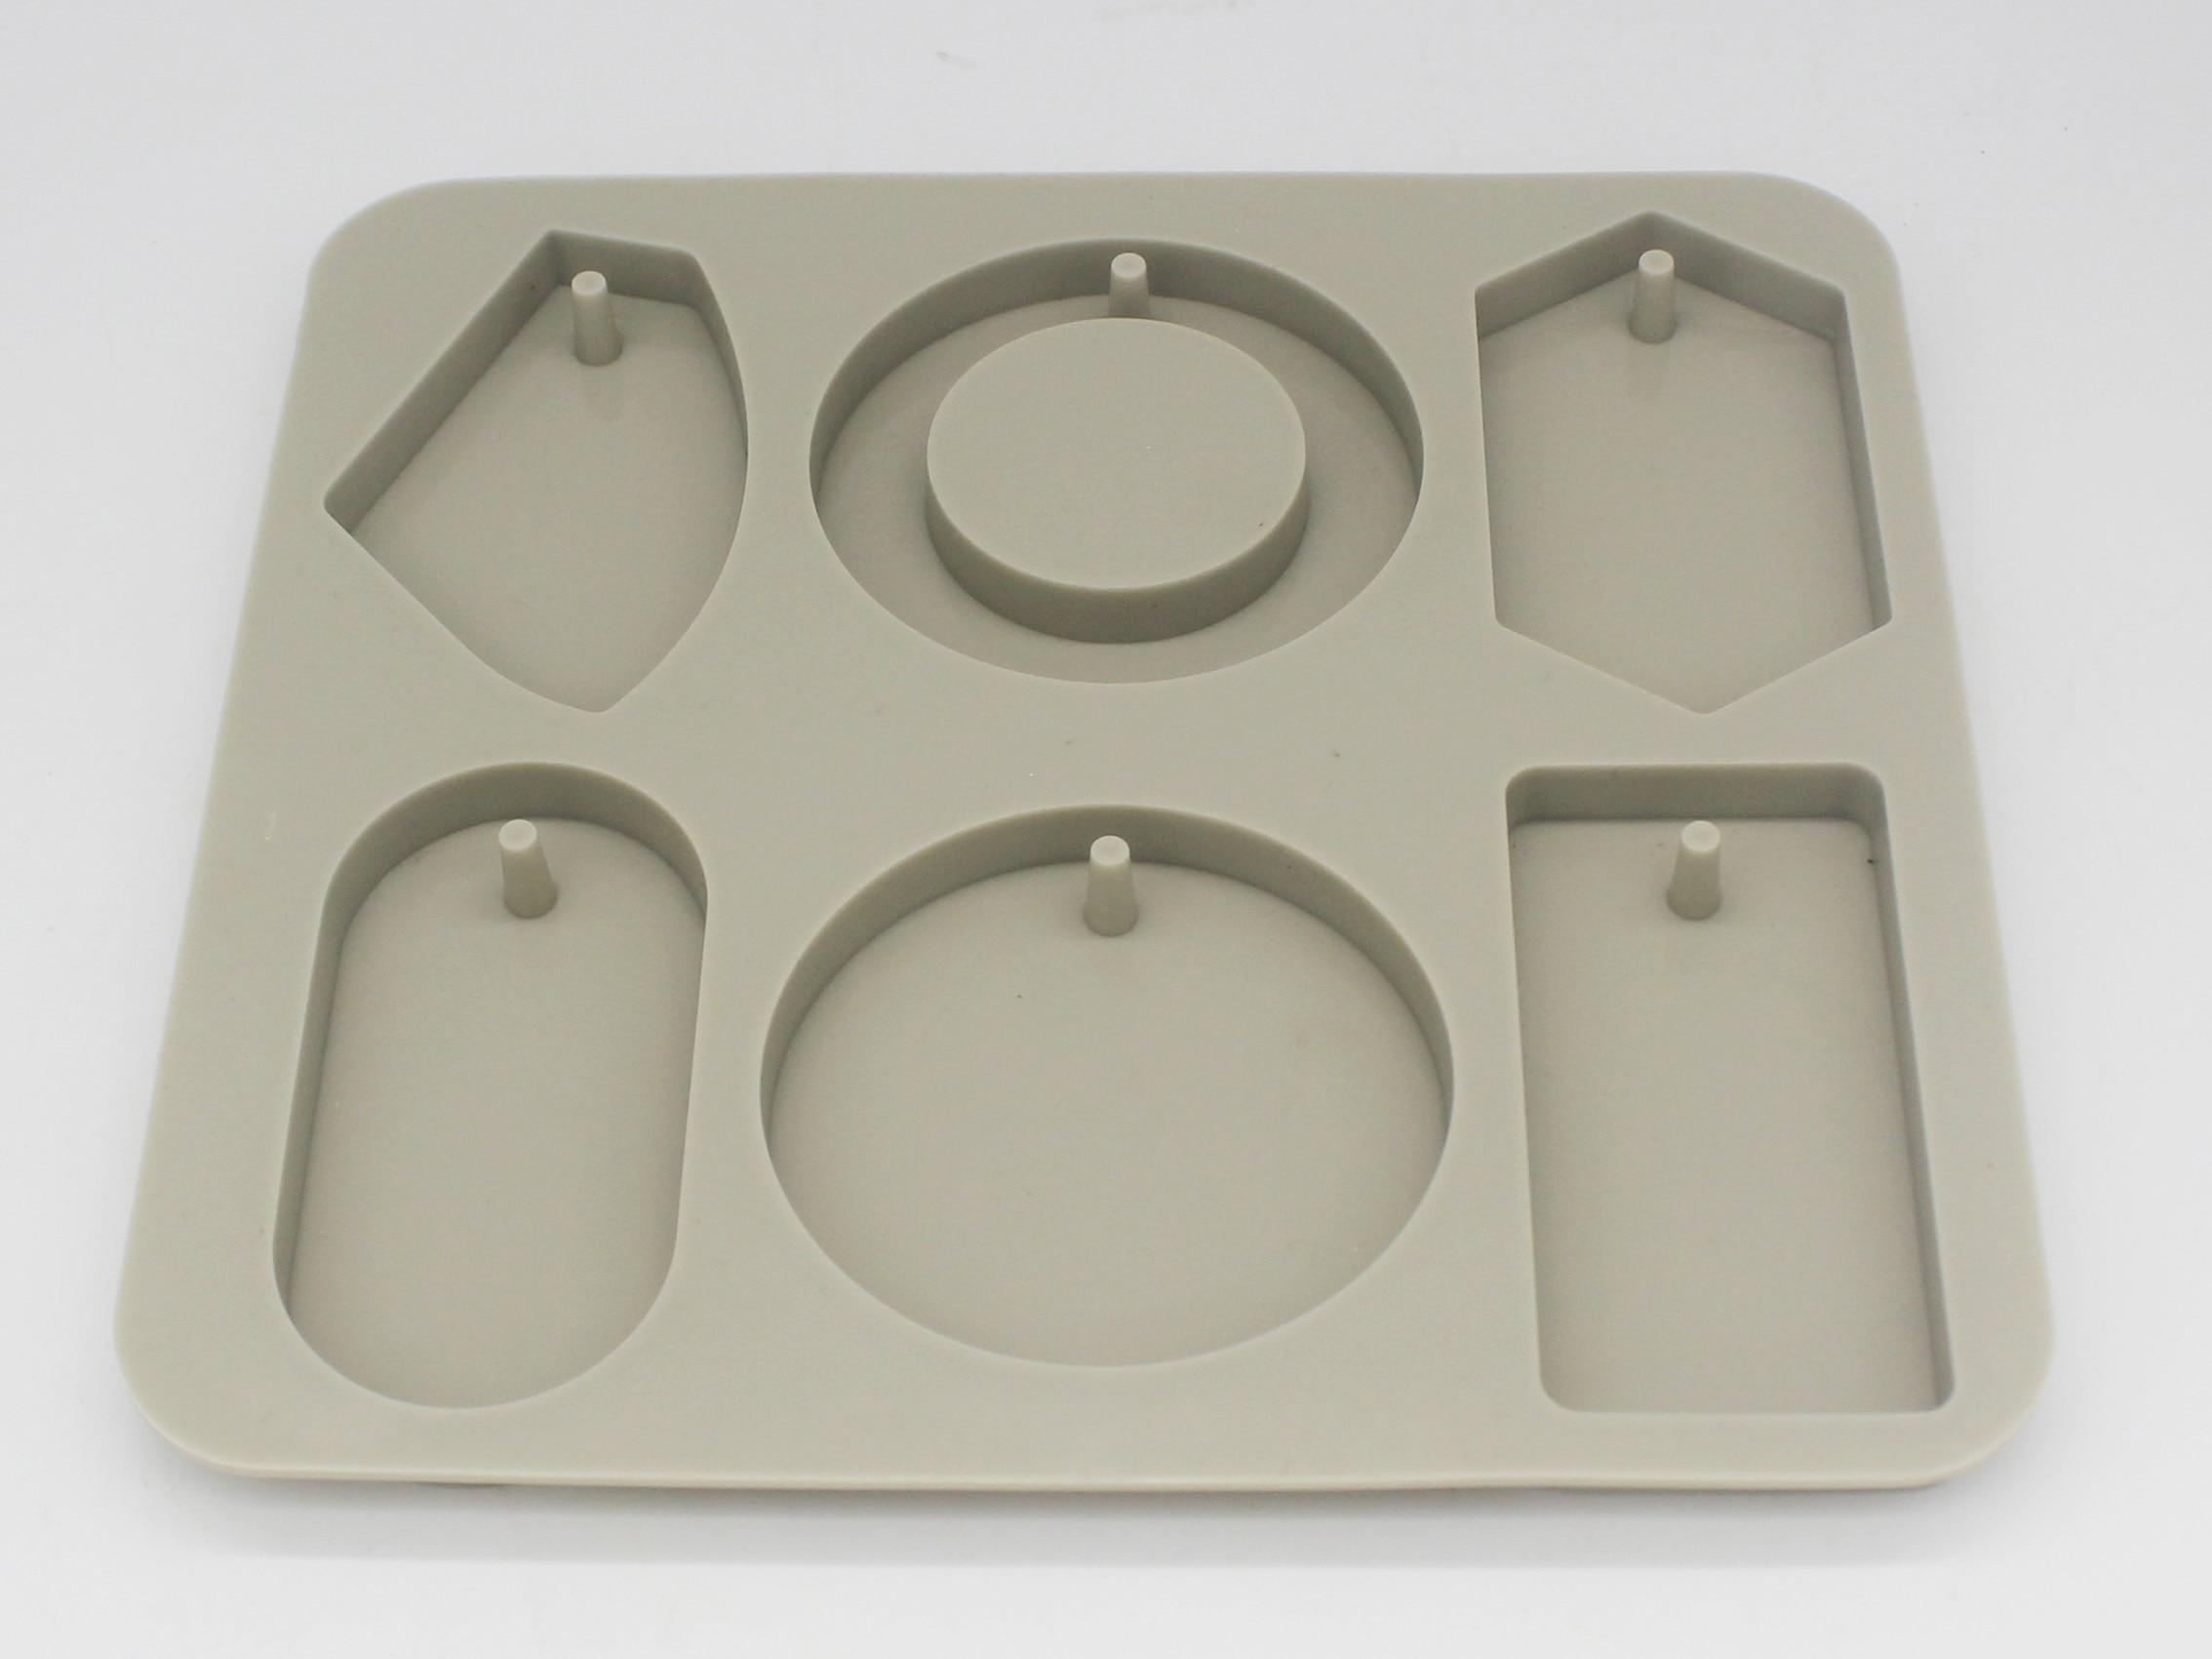 Molde aromático de yeso con forma variada para tableta, molde de arcilla colgante de yeso de silicona